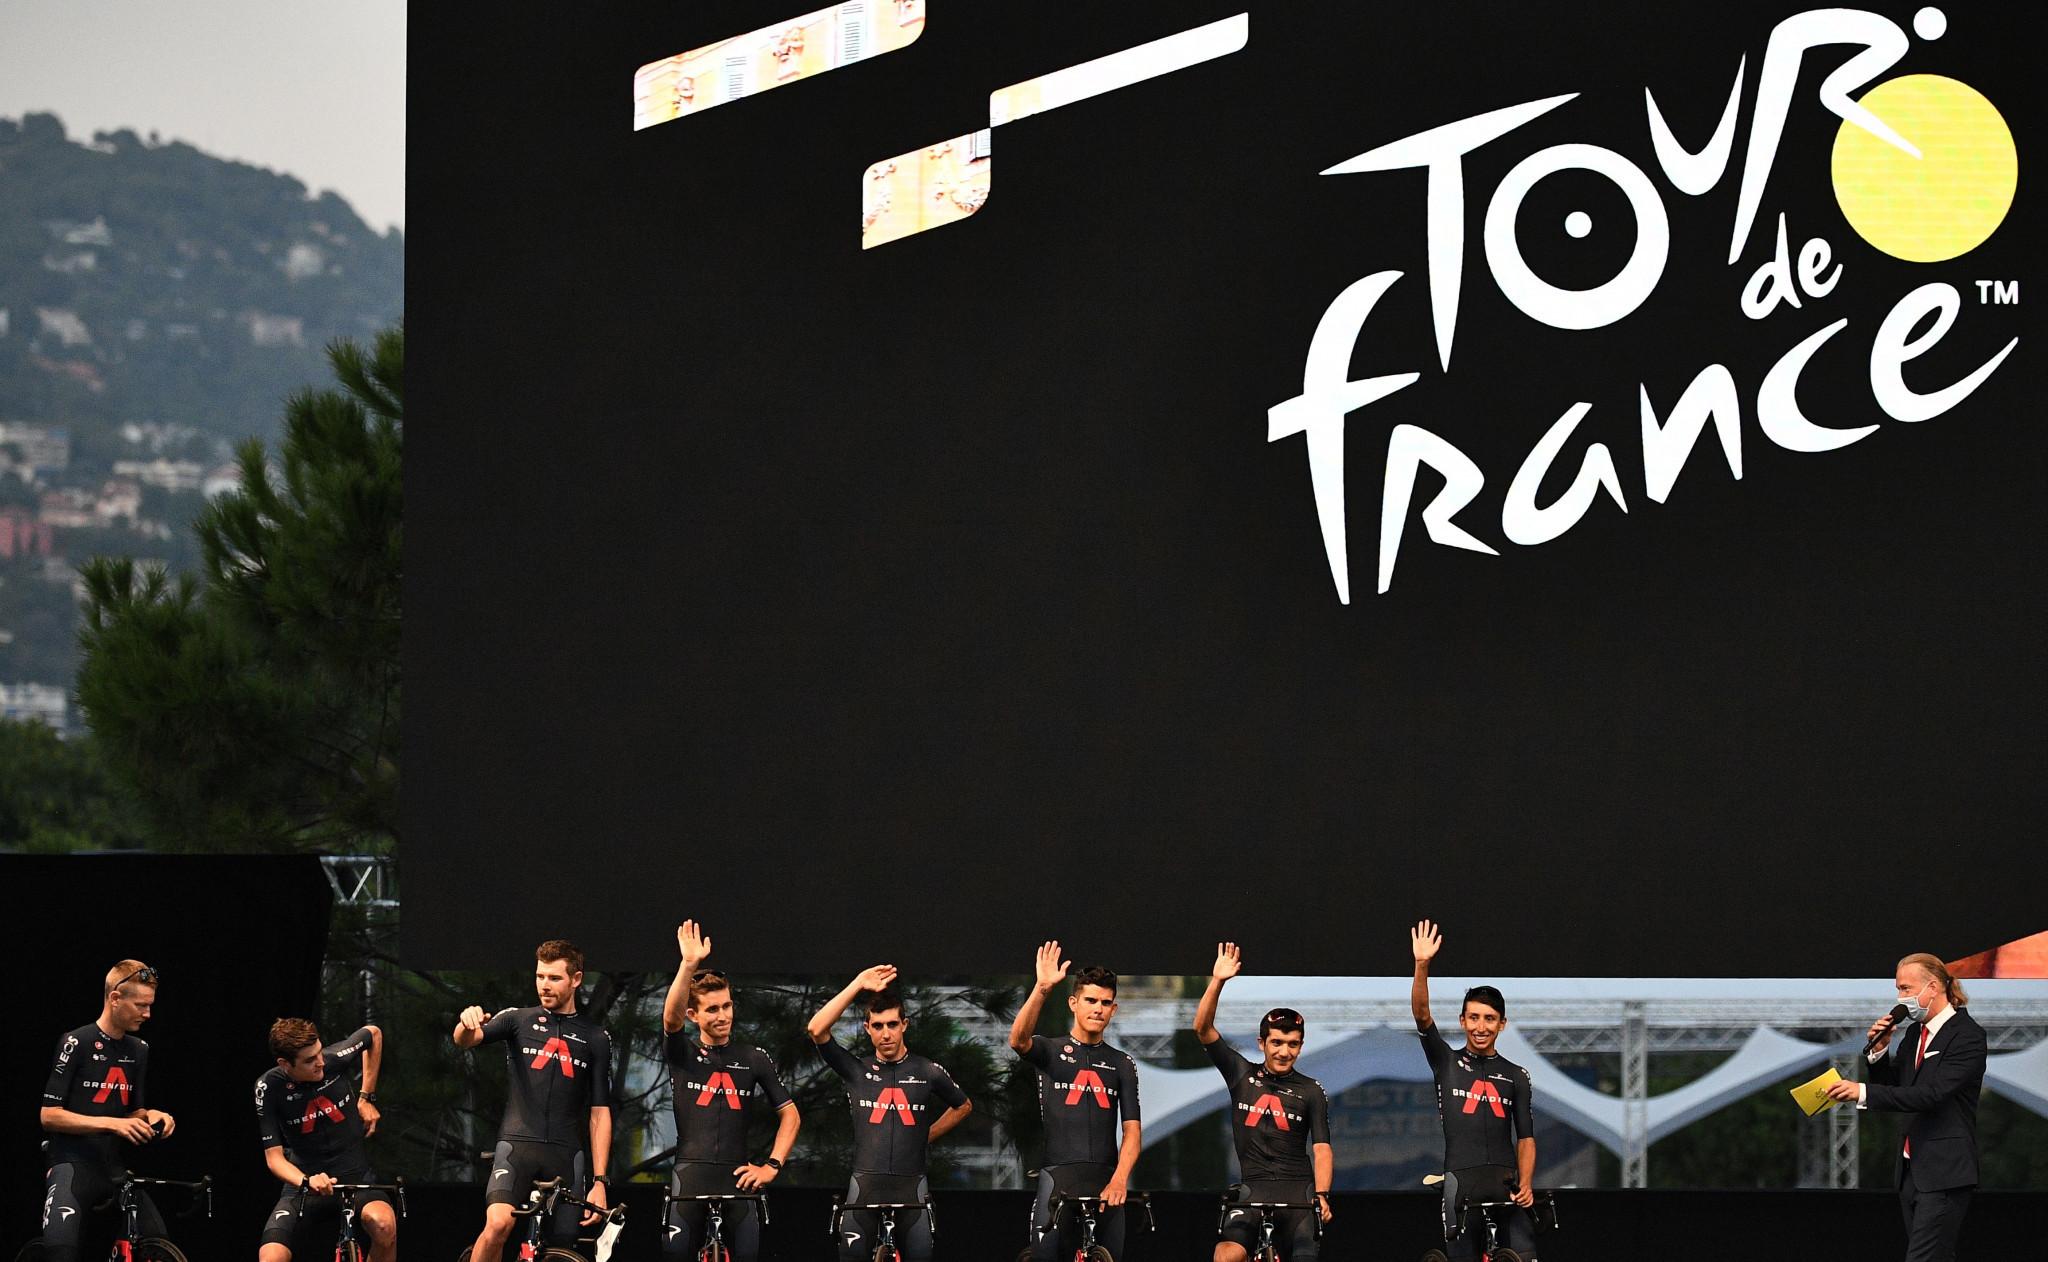 Tour de France set to begin amid uncertainty due to coronavirus